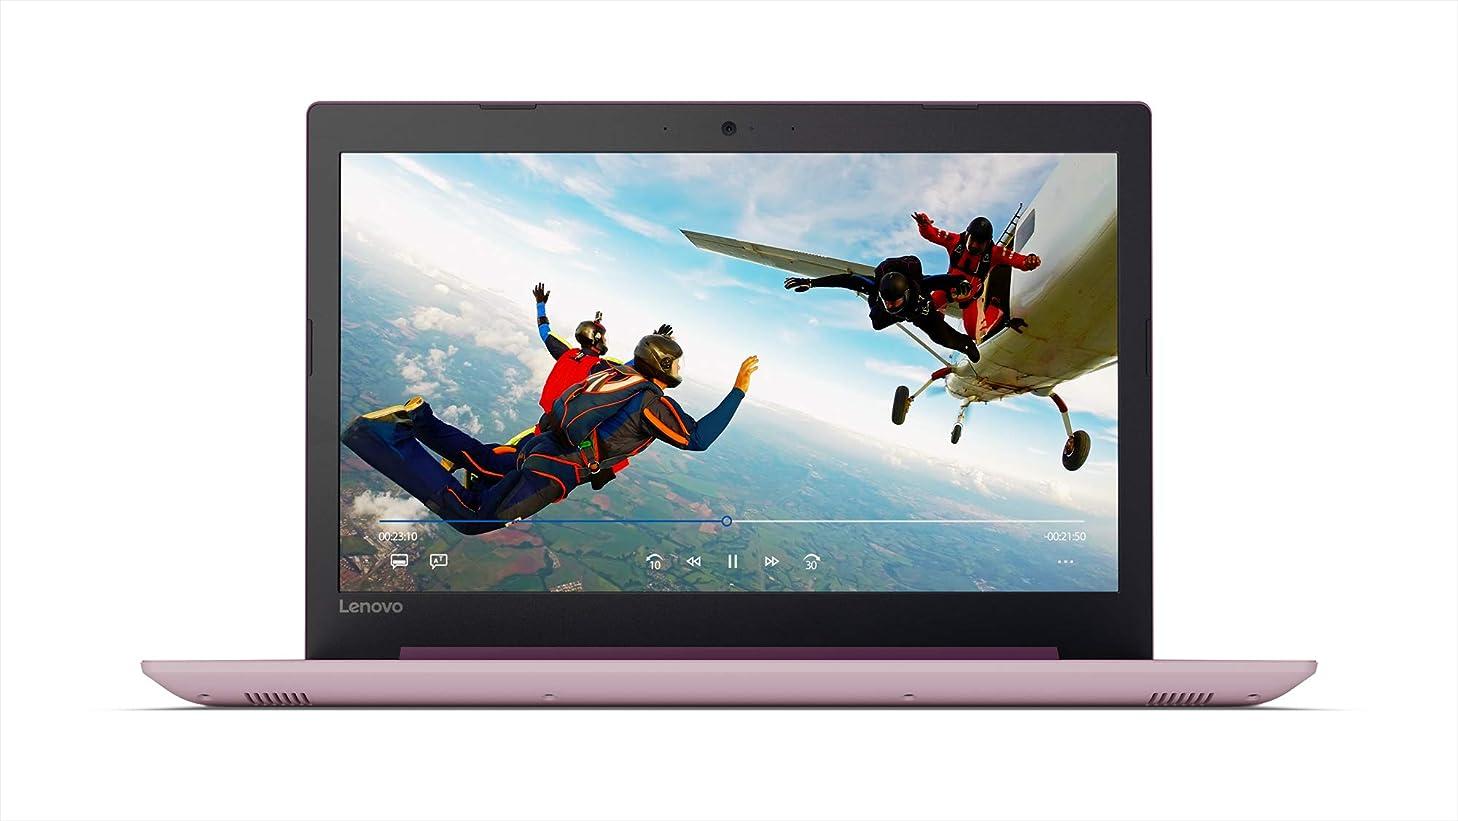 2018 Newest Premium Flagship Lenovo Ideapad 330 15.6 Inch HD Laptop (Intel Core i3-8130U (Beat i5-7200U) up to 3.4 GHz, 4GB DDR4 RAM, 128GB SSD, WiFi, Bluetooth, HDMI, Windows 10) (Purple)